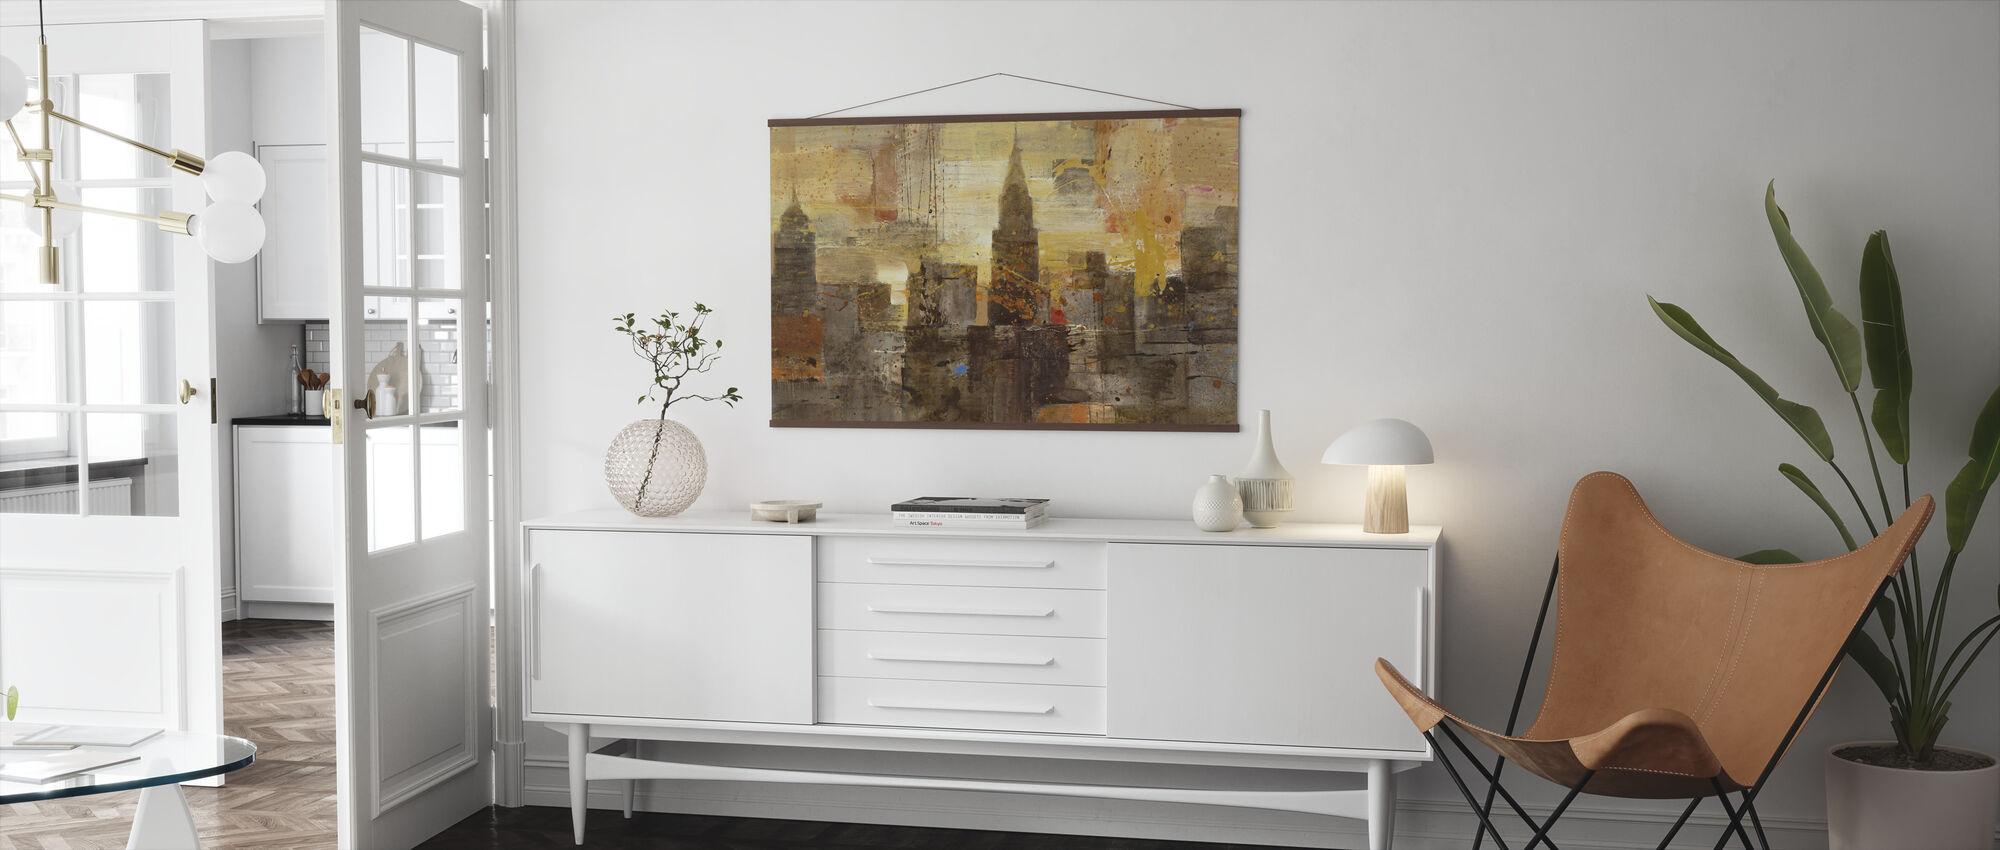 Fireworks - Poster - Living Room